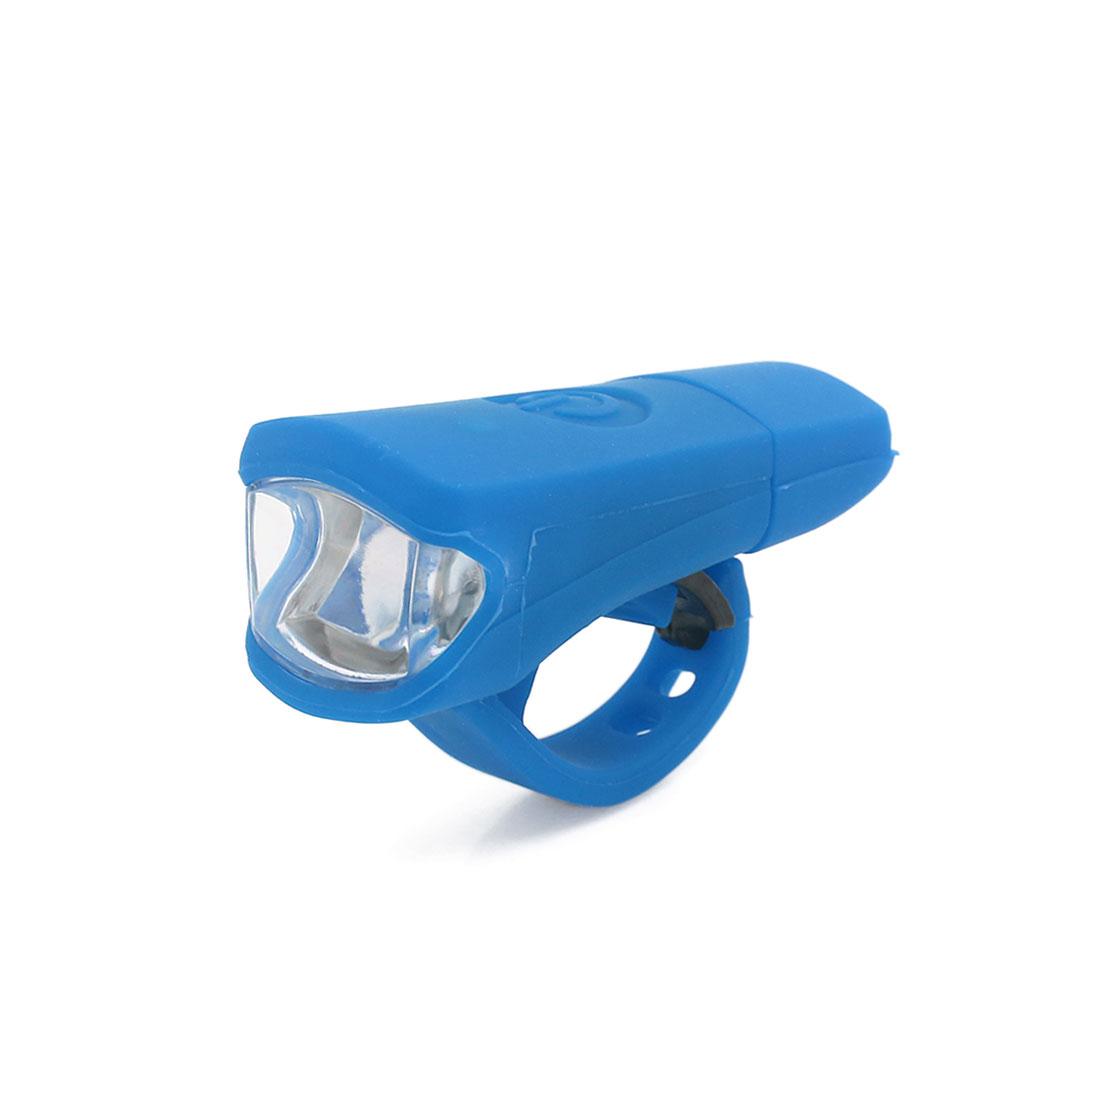 Universal Blue White Light 3 Modes 2 LED USB Rechargeable Bike Headlight